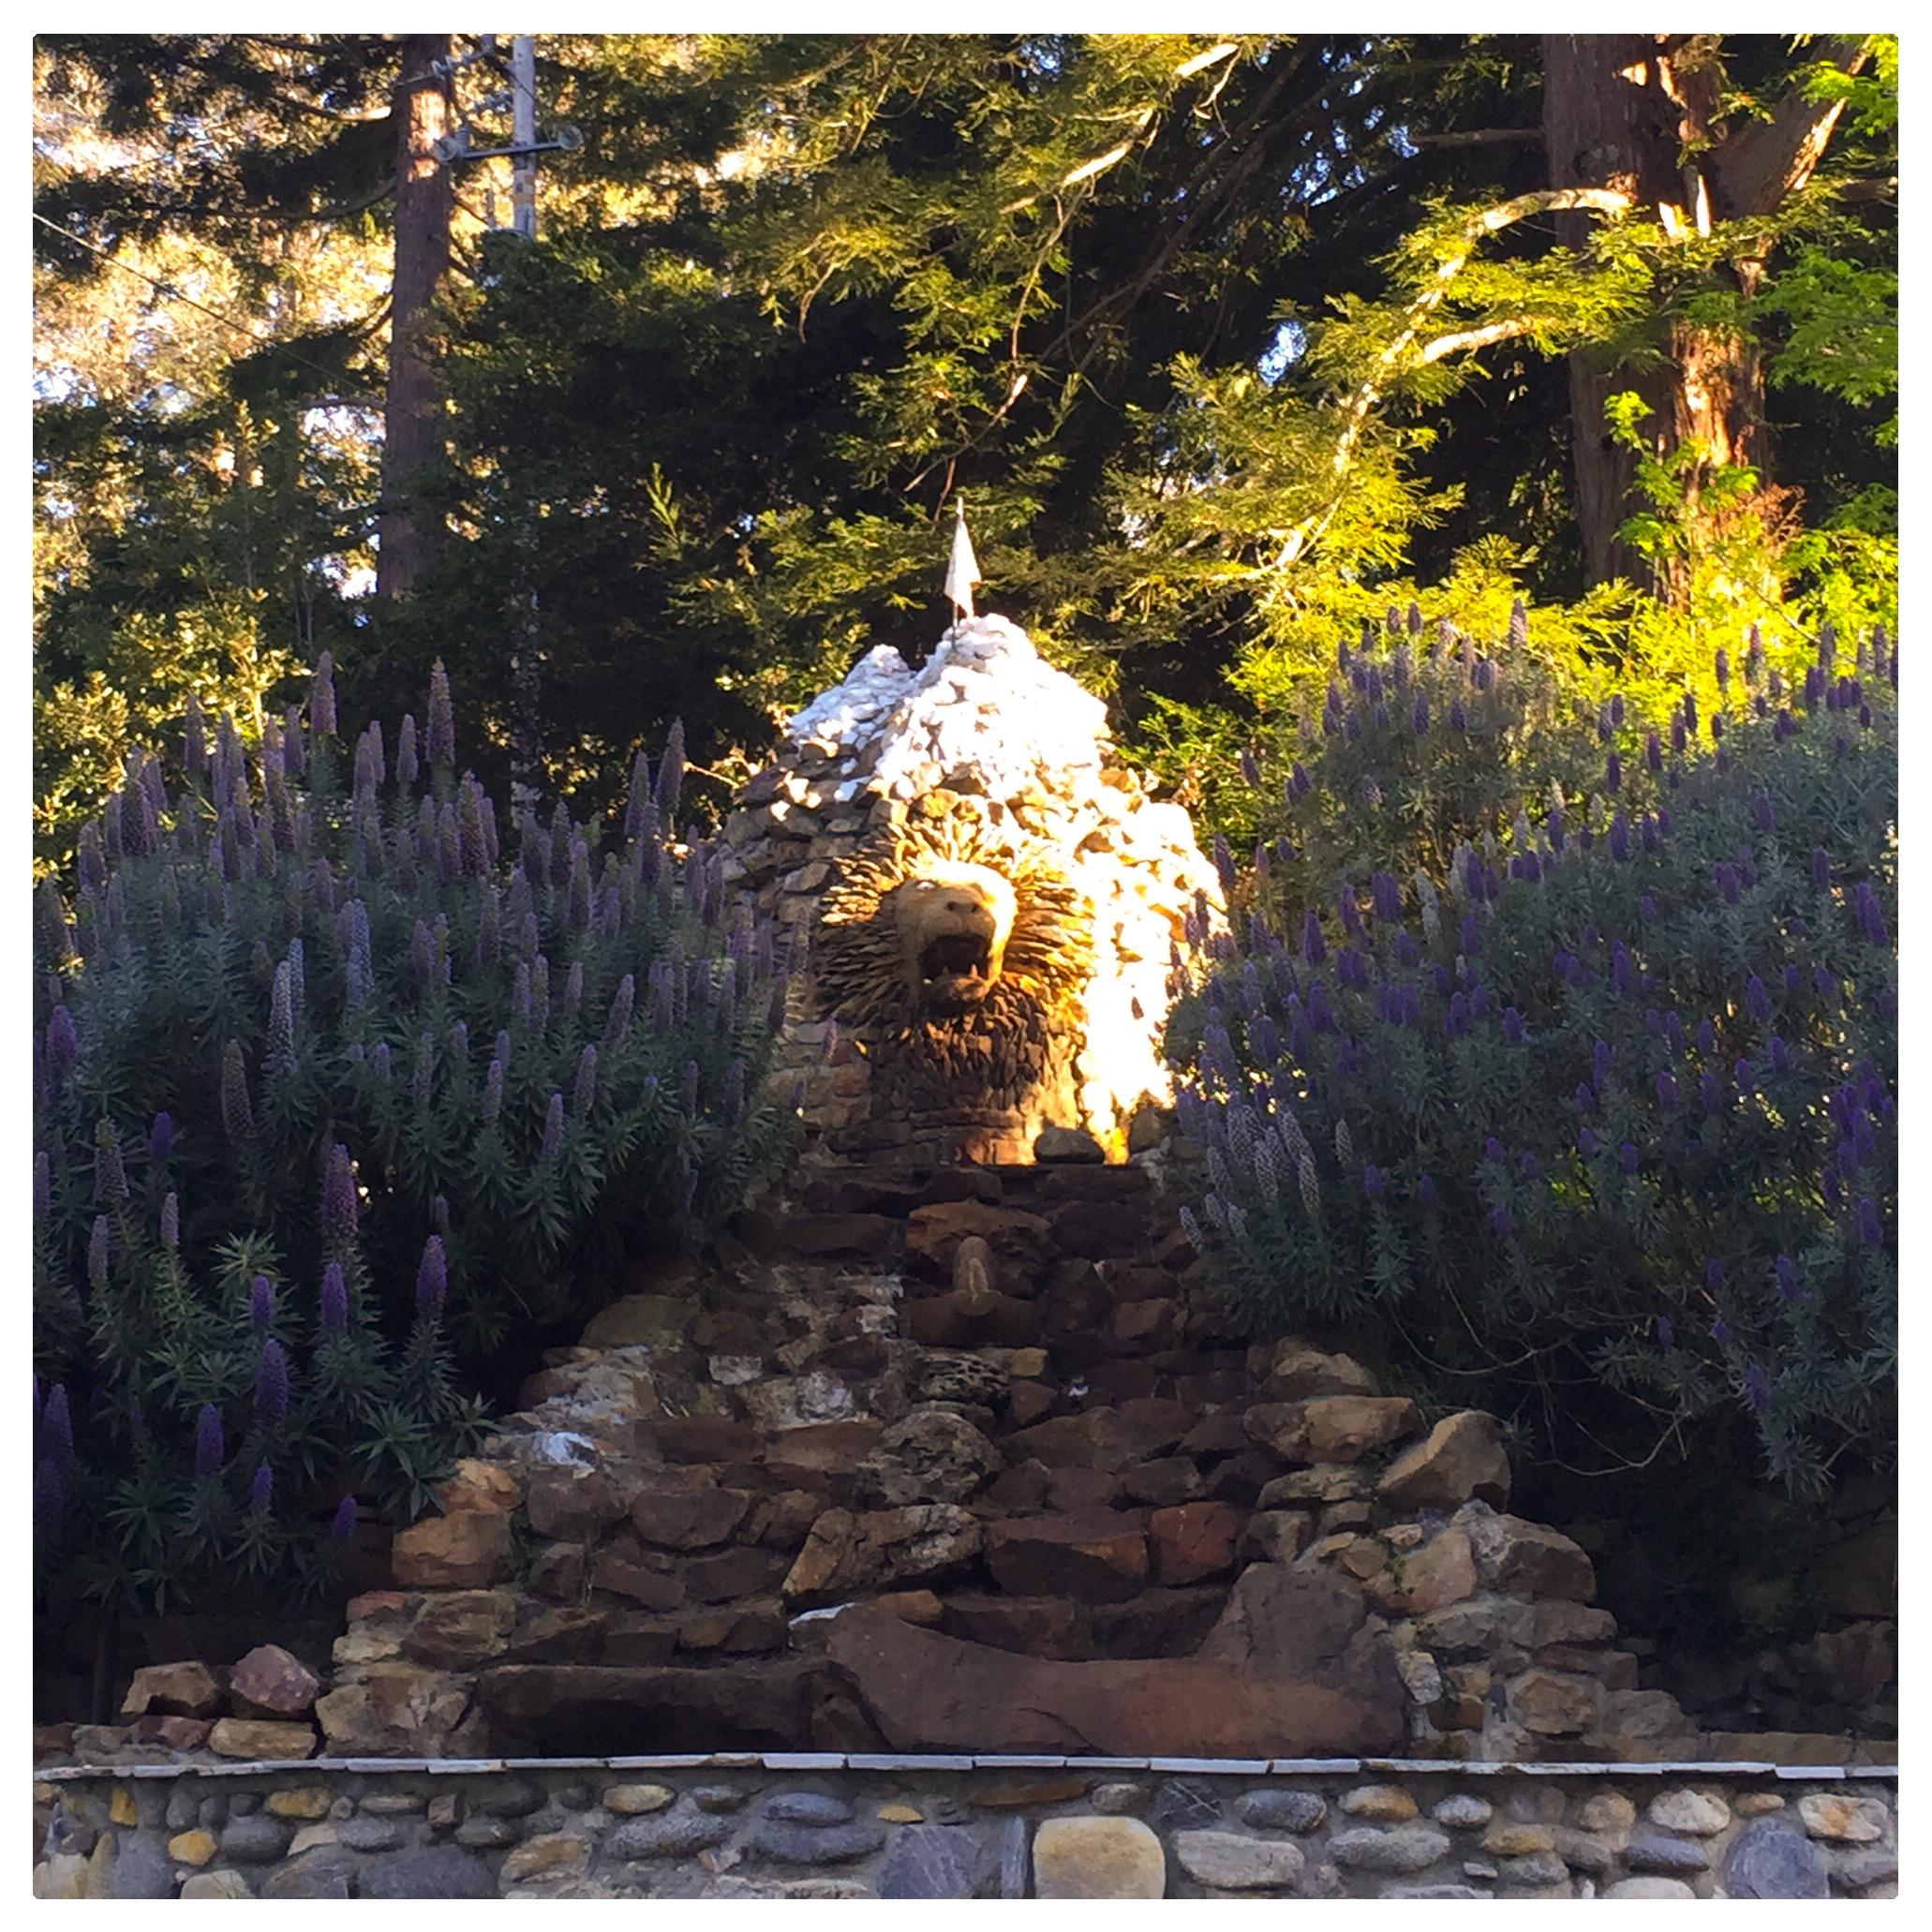 Rock sculpture along the grounds